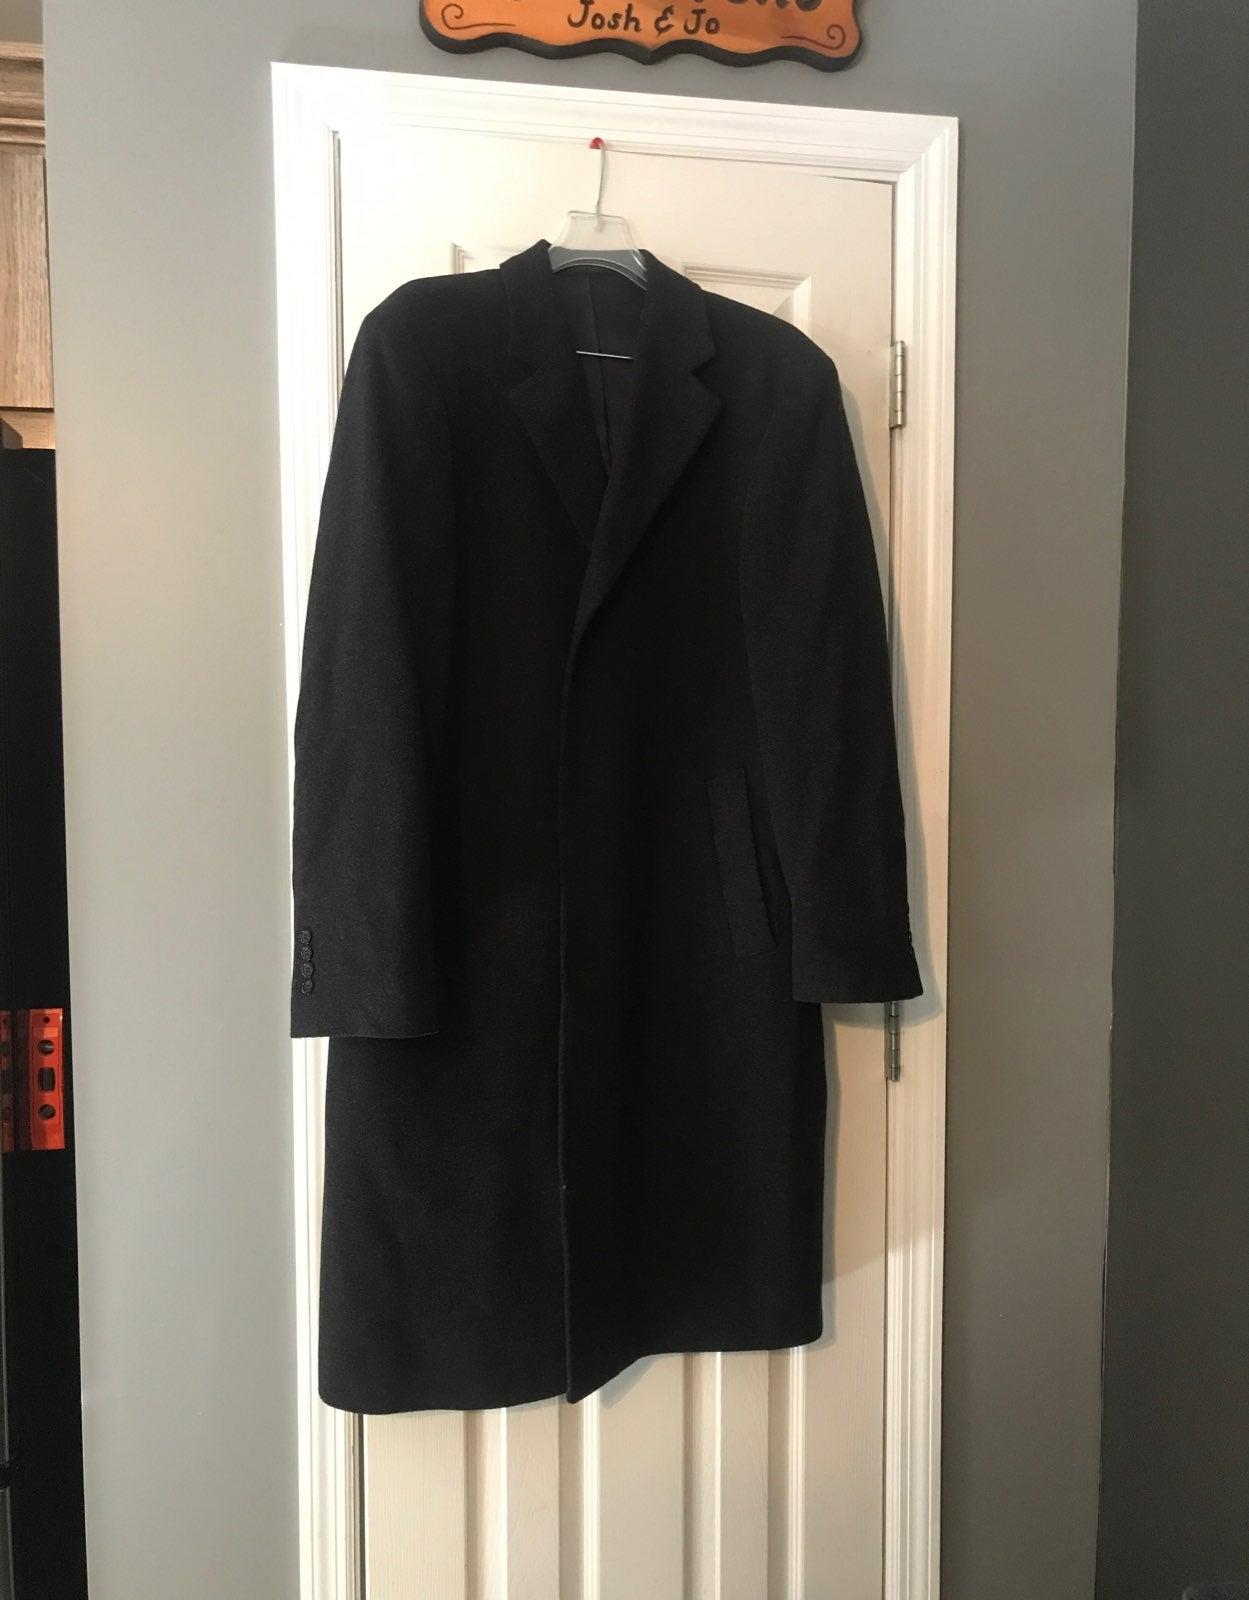 Mens wool dress jacket/coat